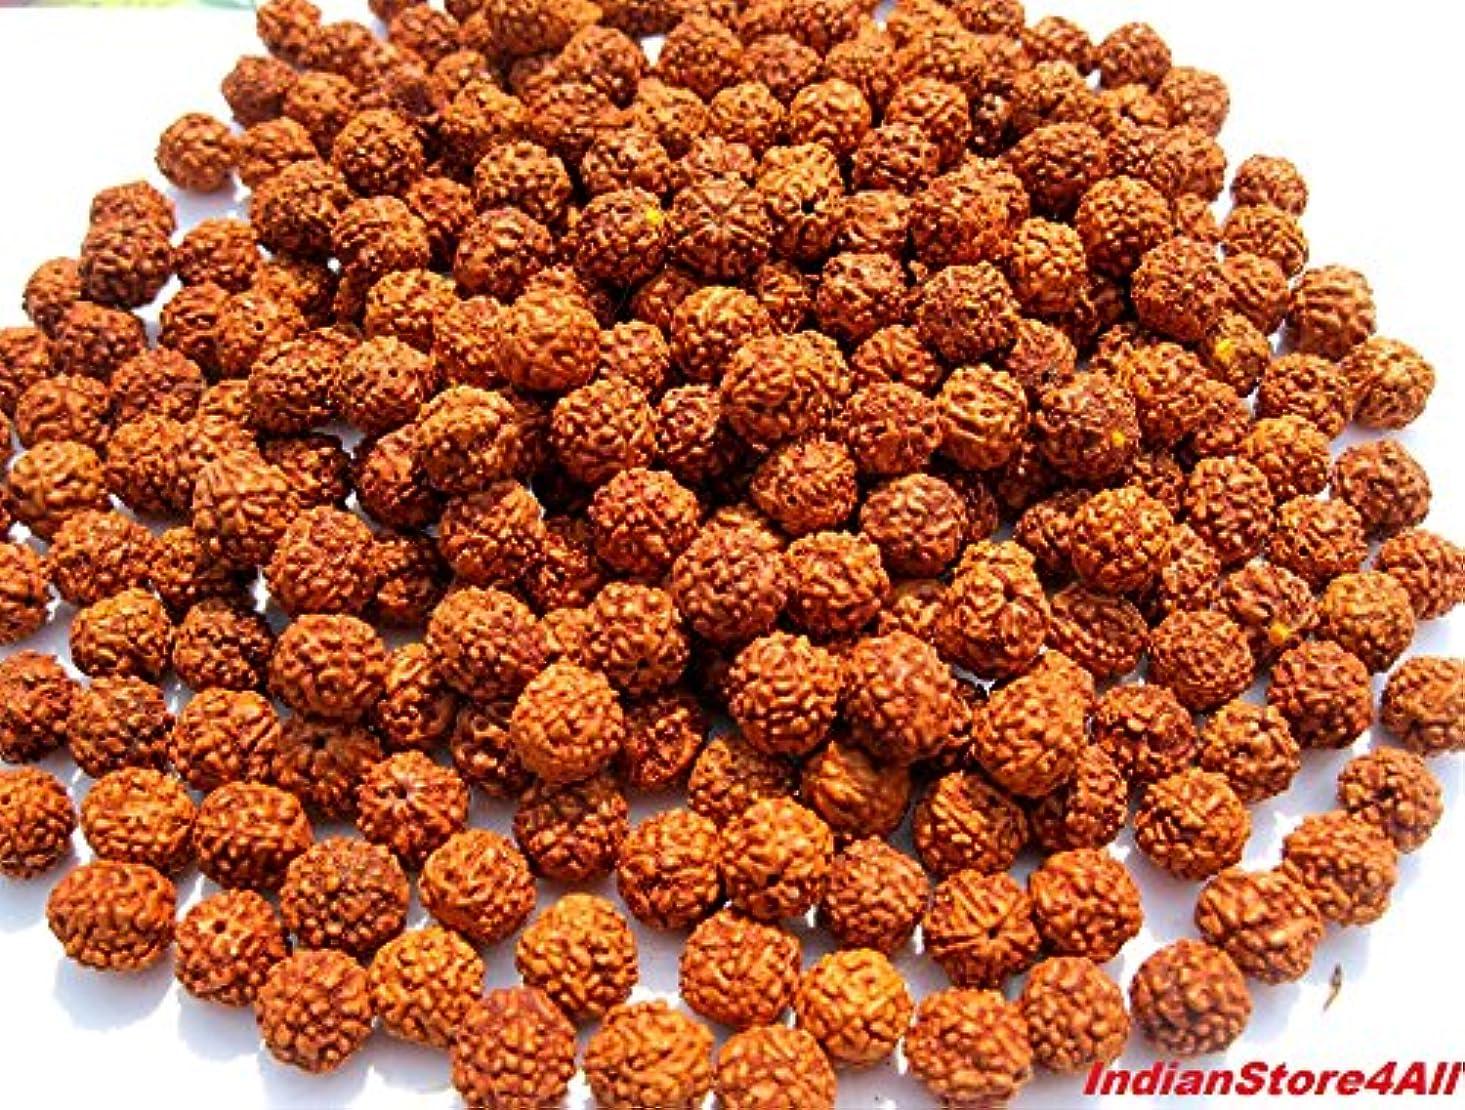 IndianStore4All - Lot of 1000 Rudraksh Seeds Loose Beads, Rudraksha Beads, 8mm rnmtq621631